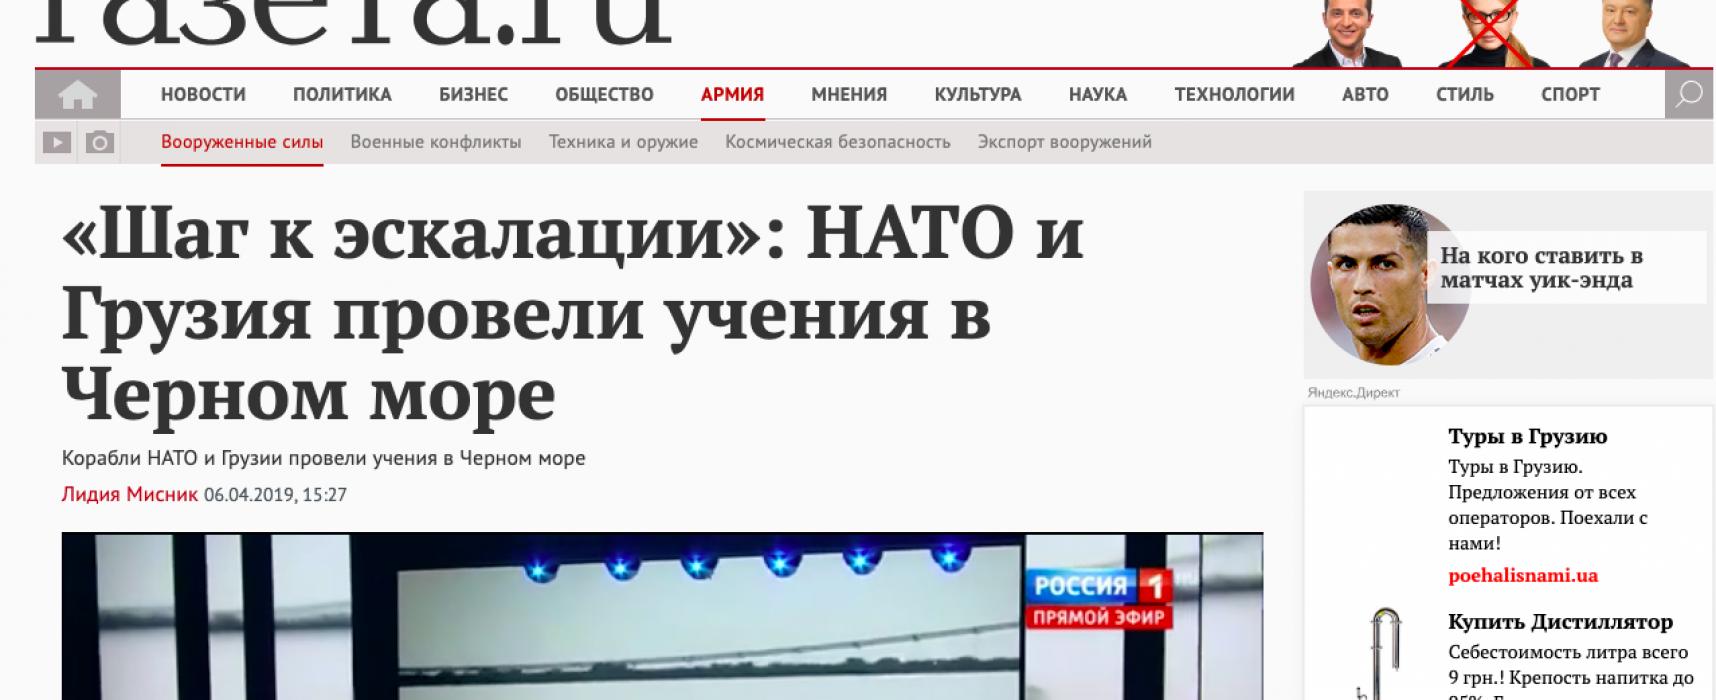 Fake: NATO, Ukrajina a Gruzie vyhrocují situaci v černomořském regionu